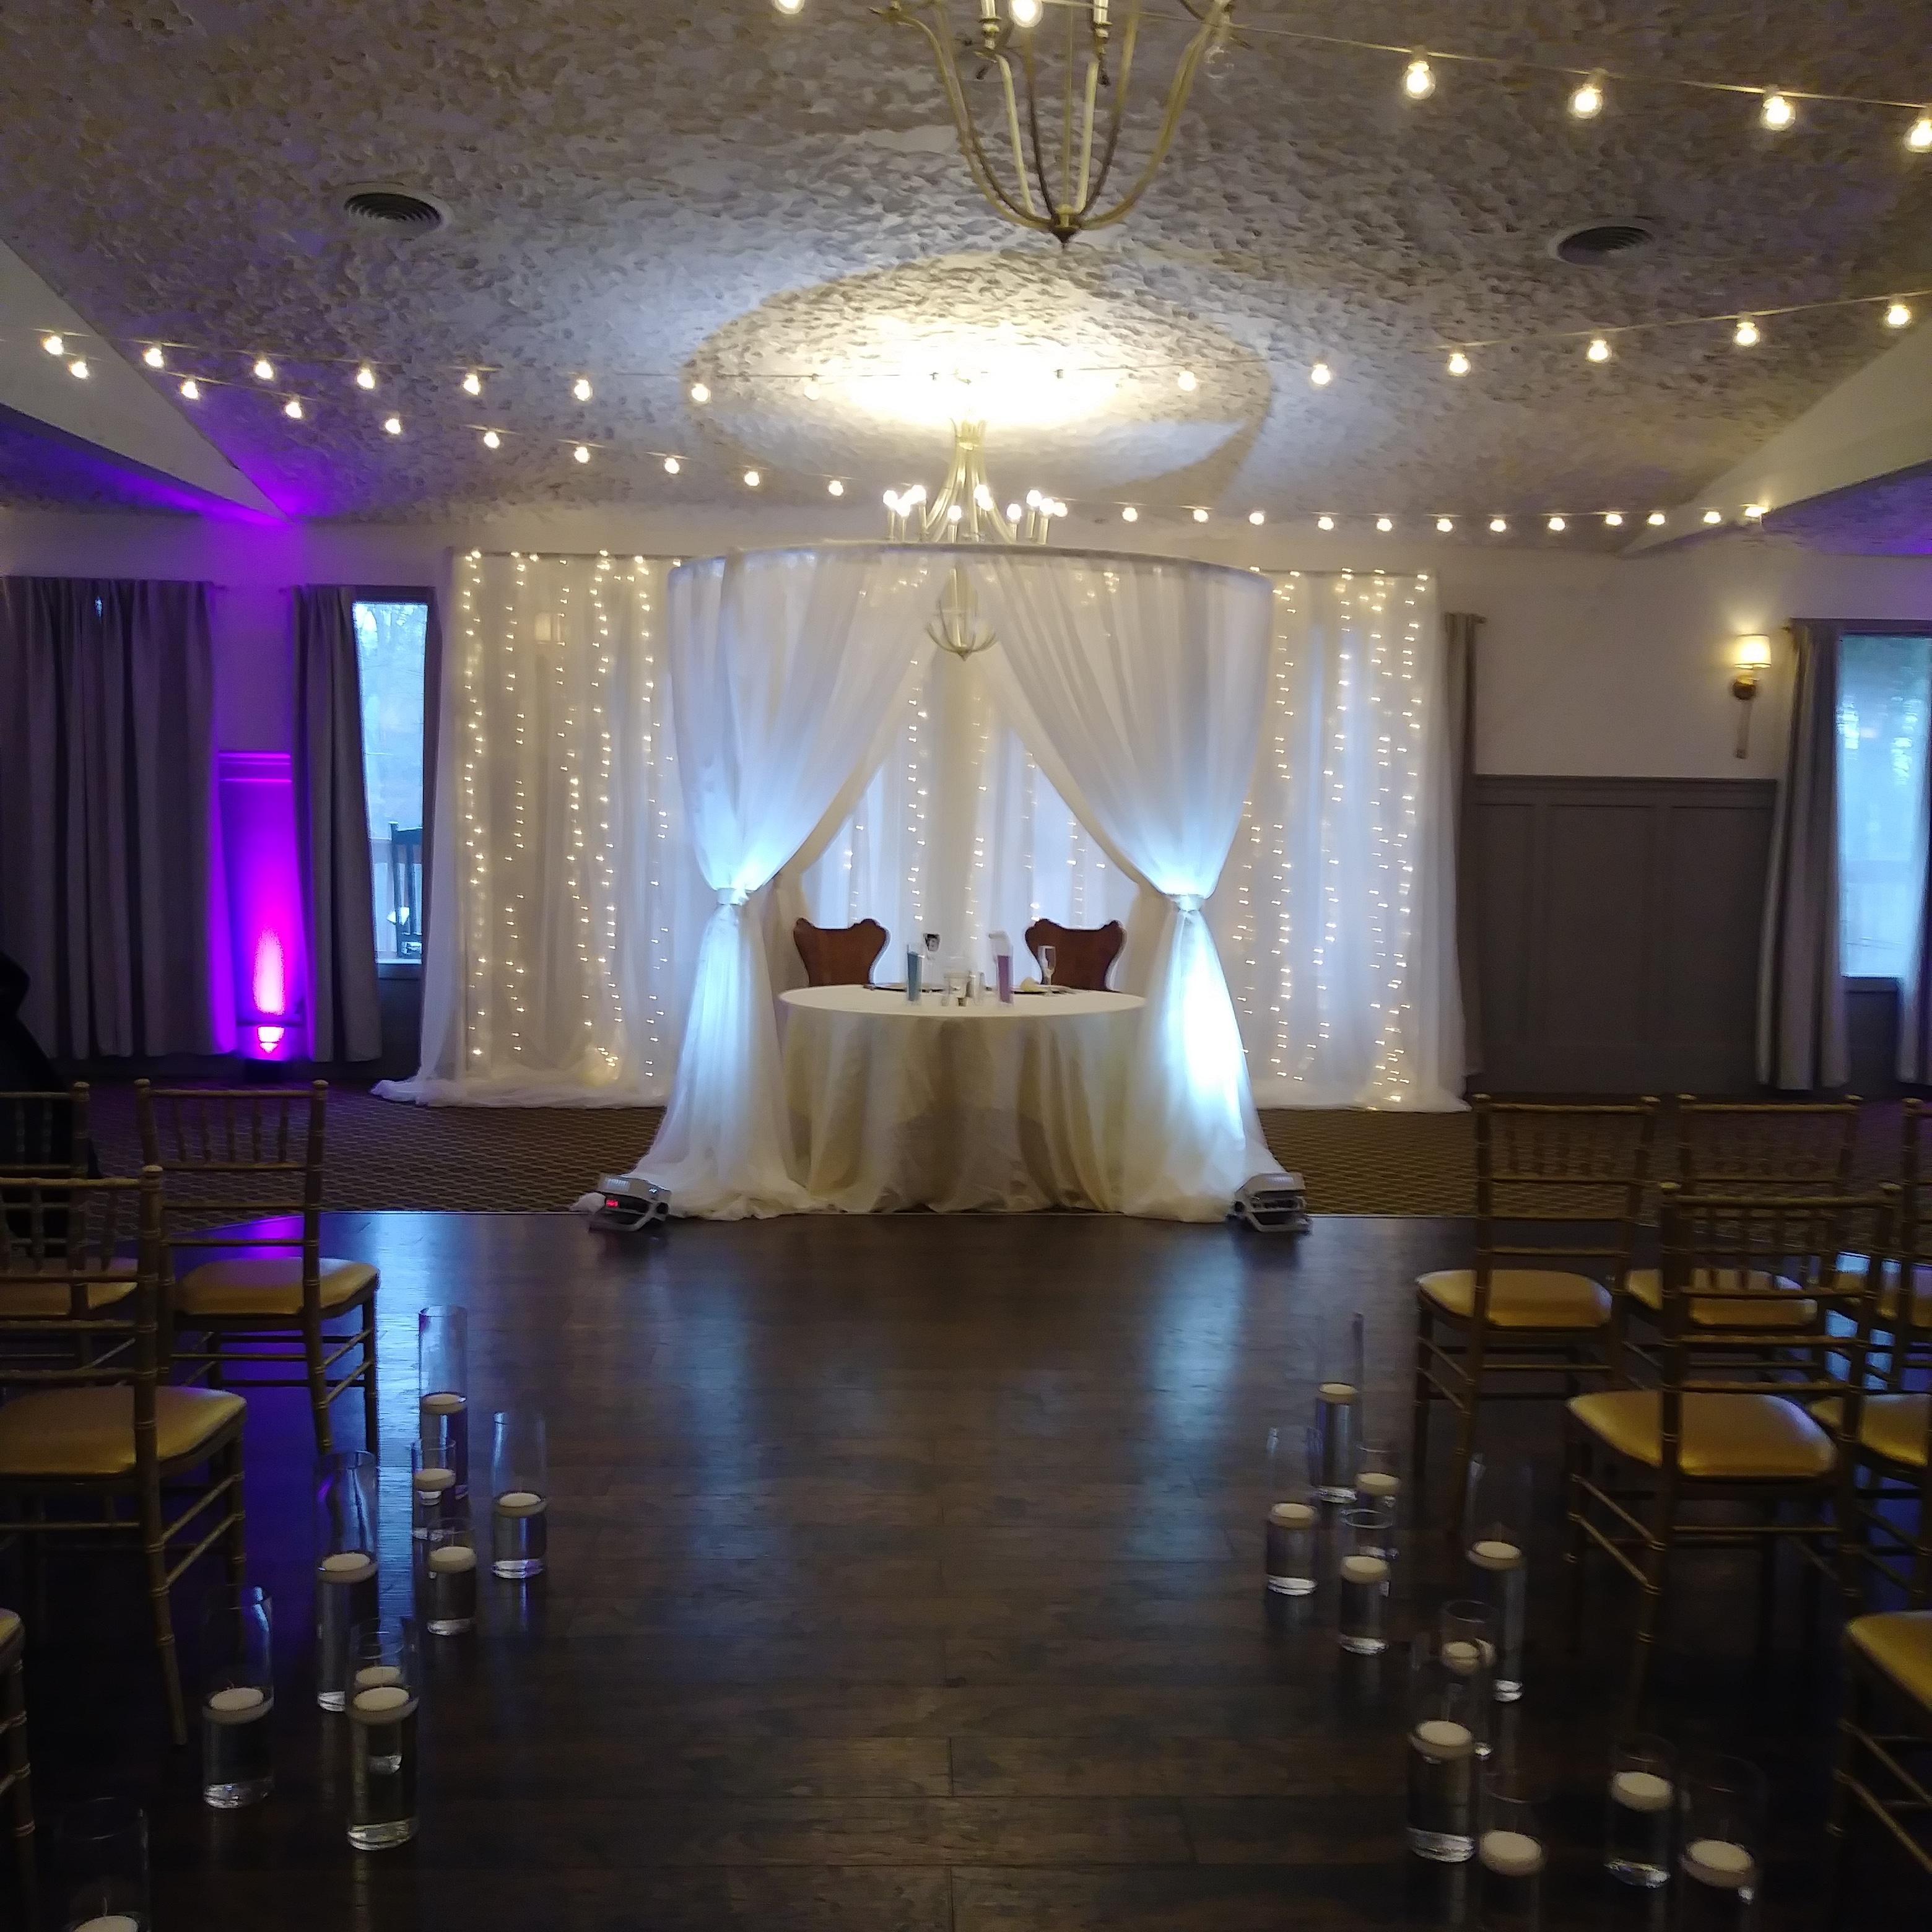 wedding pipe and drape event decor at landoll castle in columbus ohio